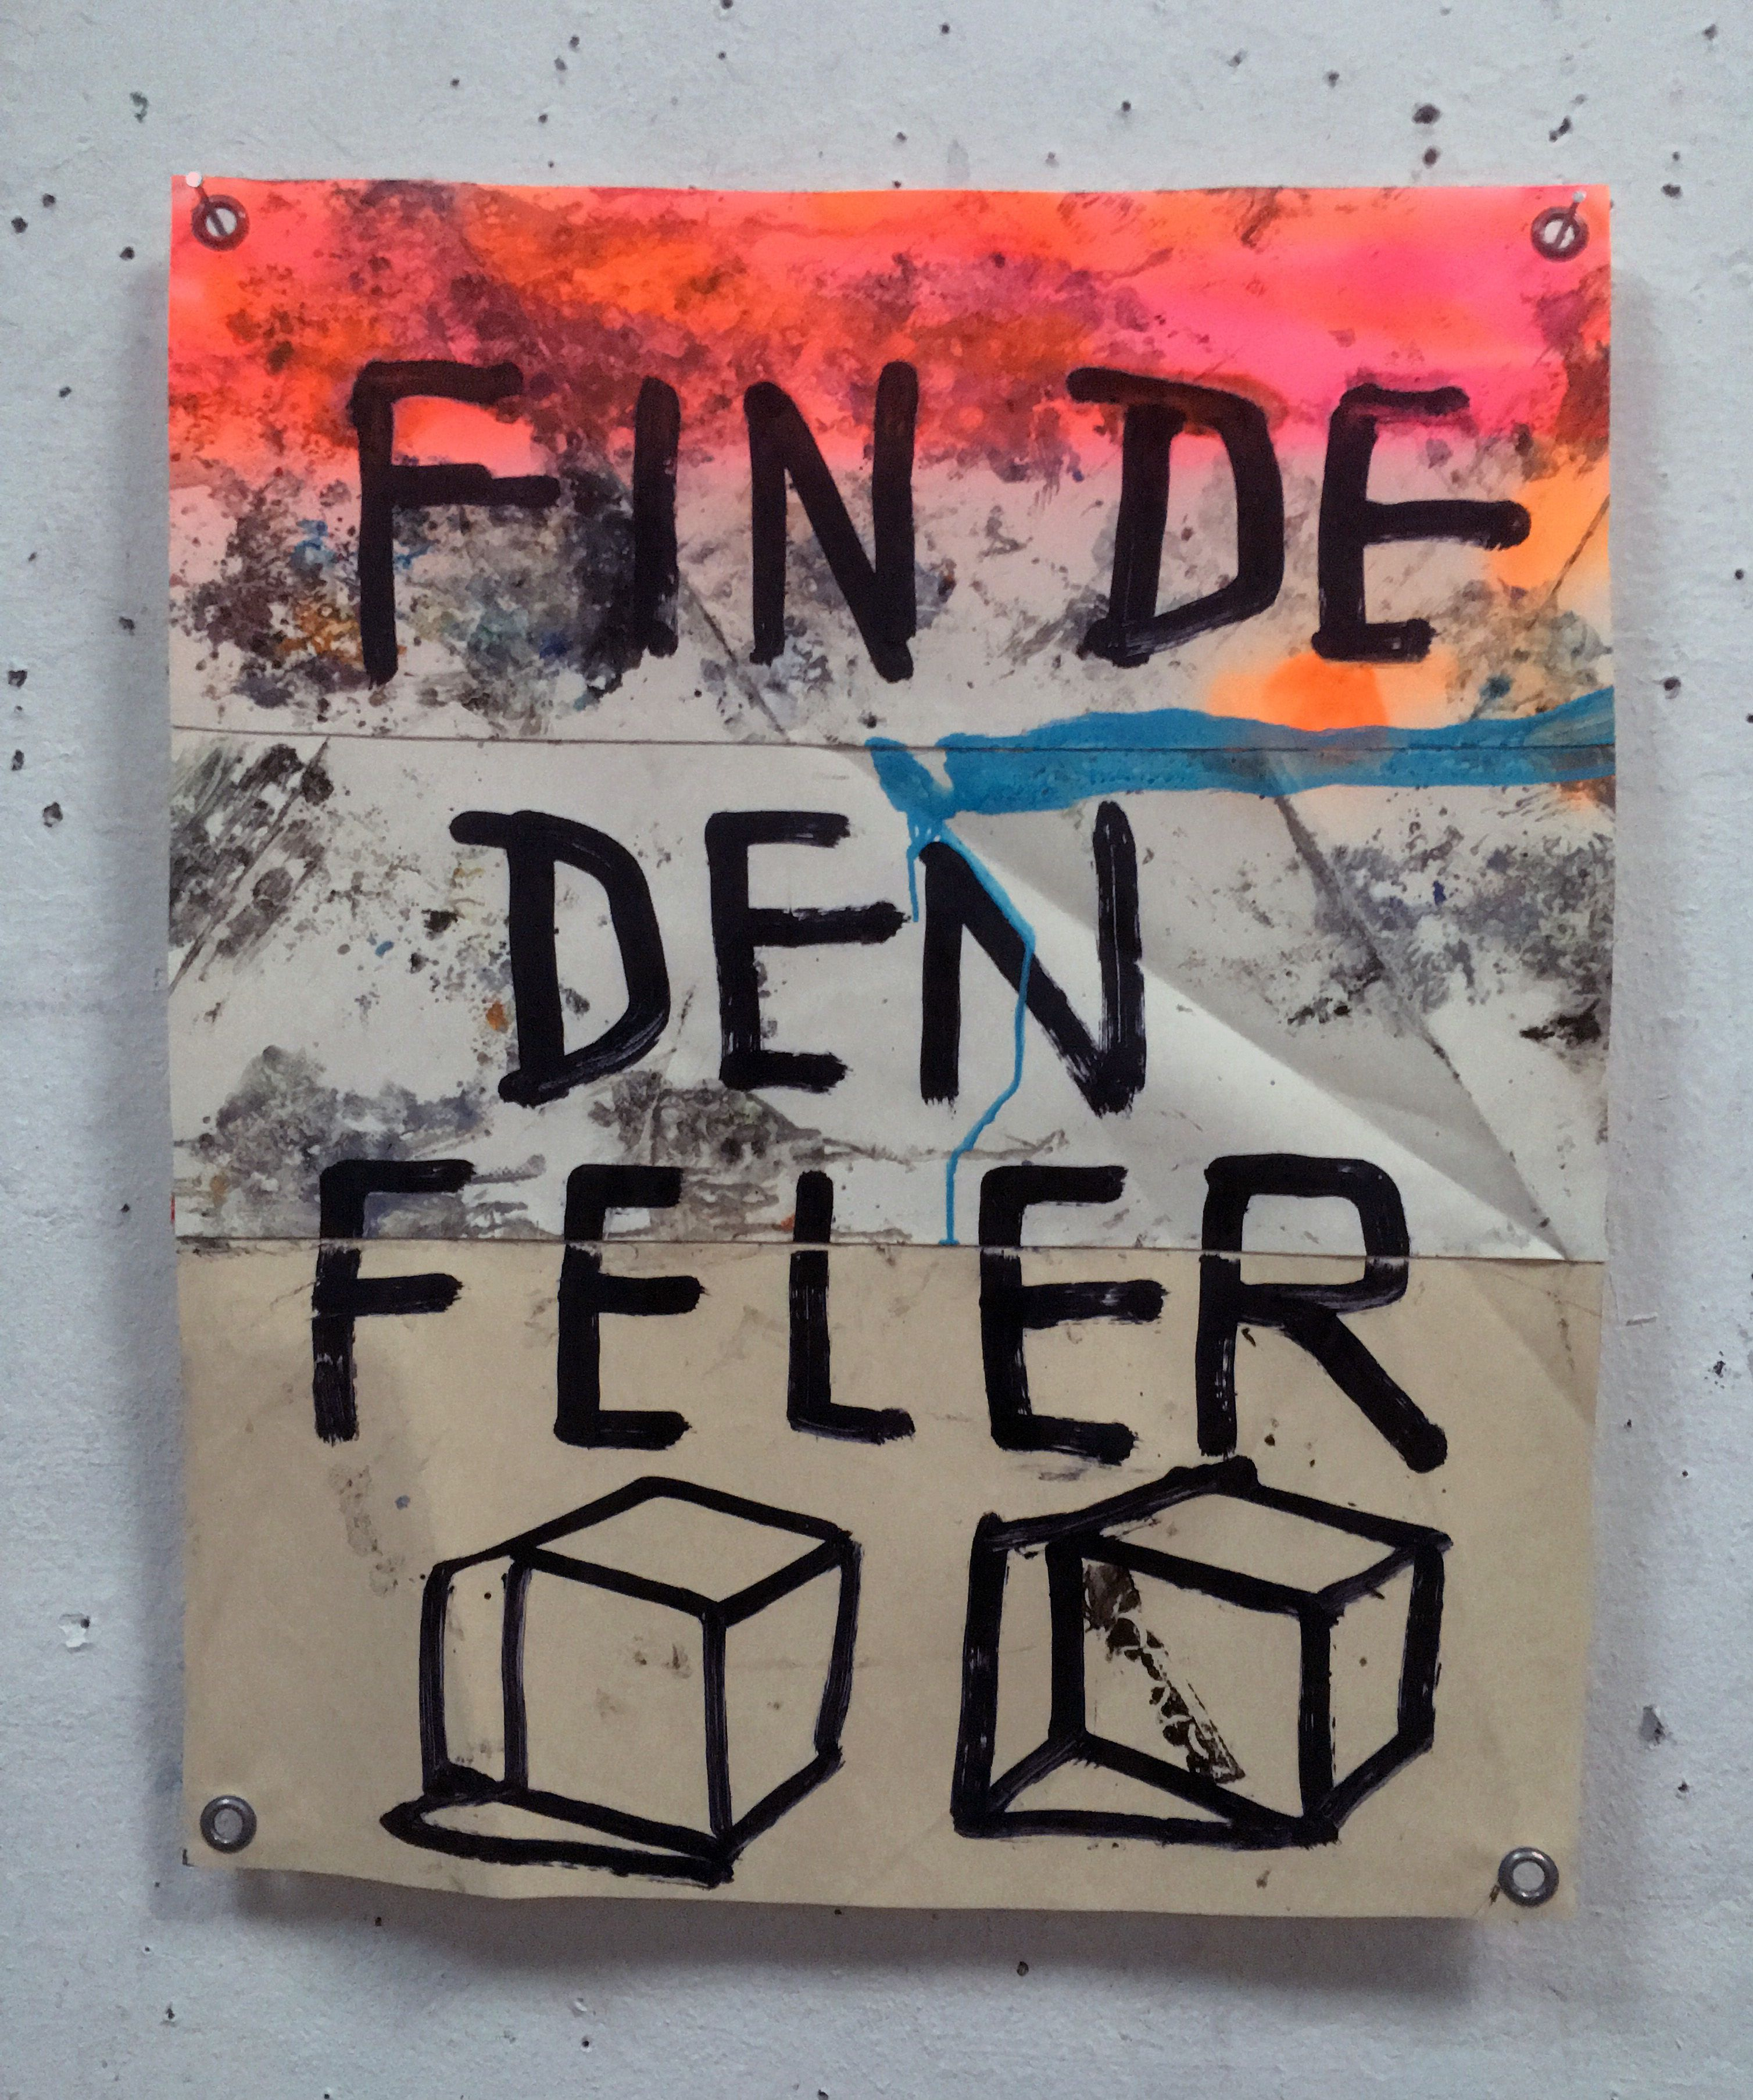 Hermann Josef Hack, FINDE, 161203, painting and spray paint on tarpaulin, 81 x 68 cm, 2016